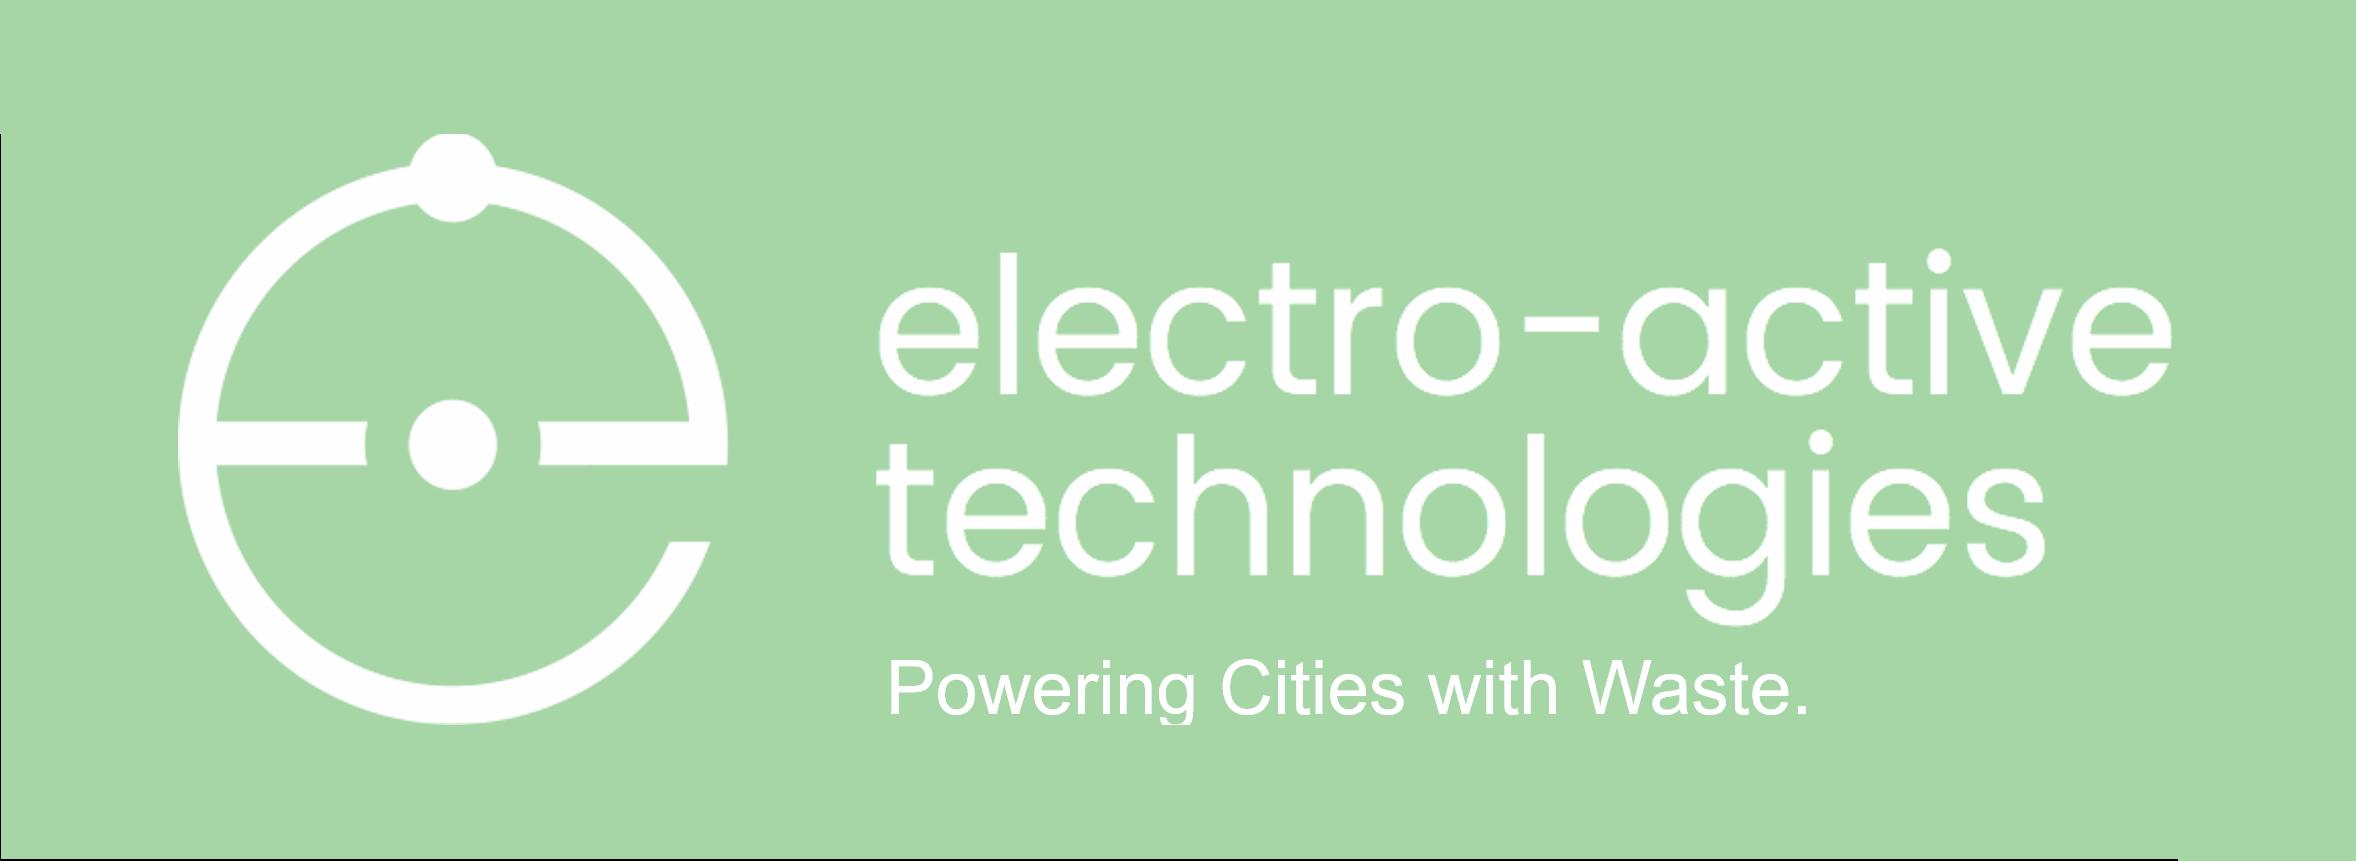 electro-active logo - Abhijeet Borole